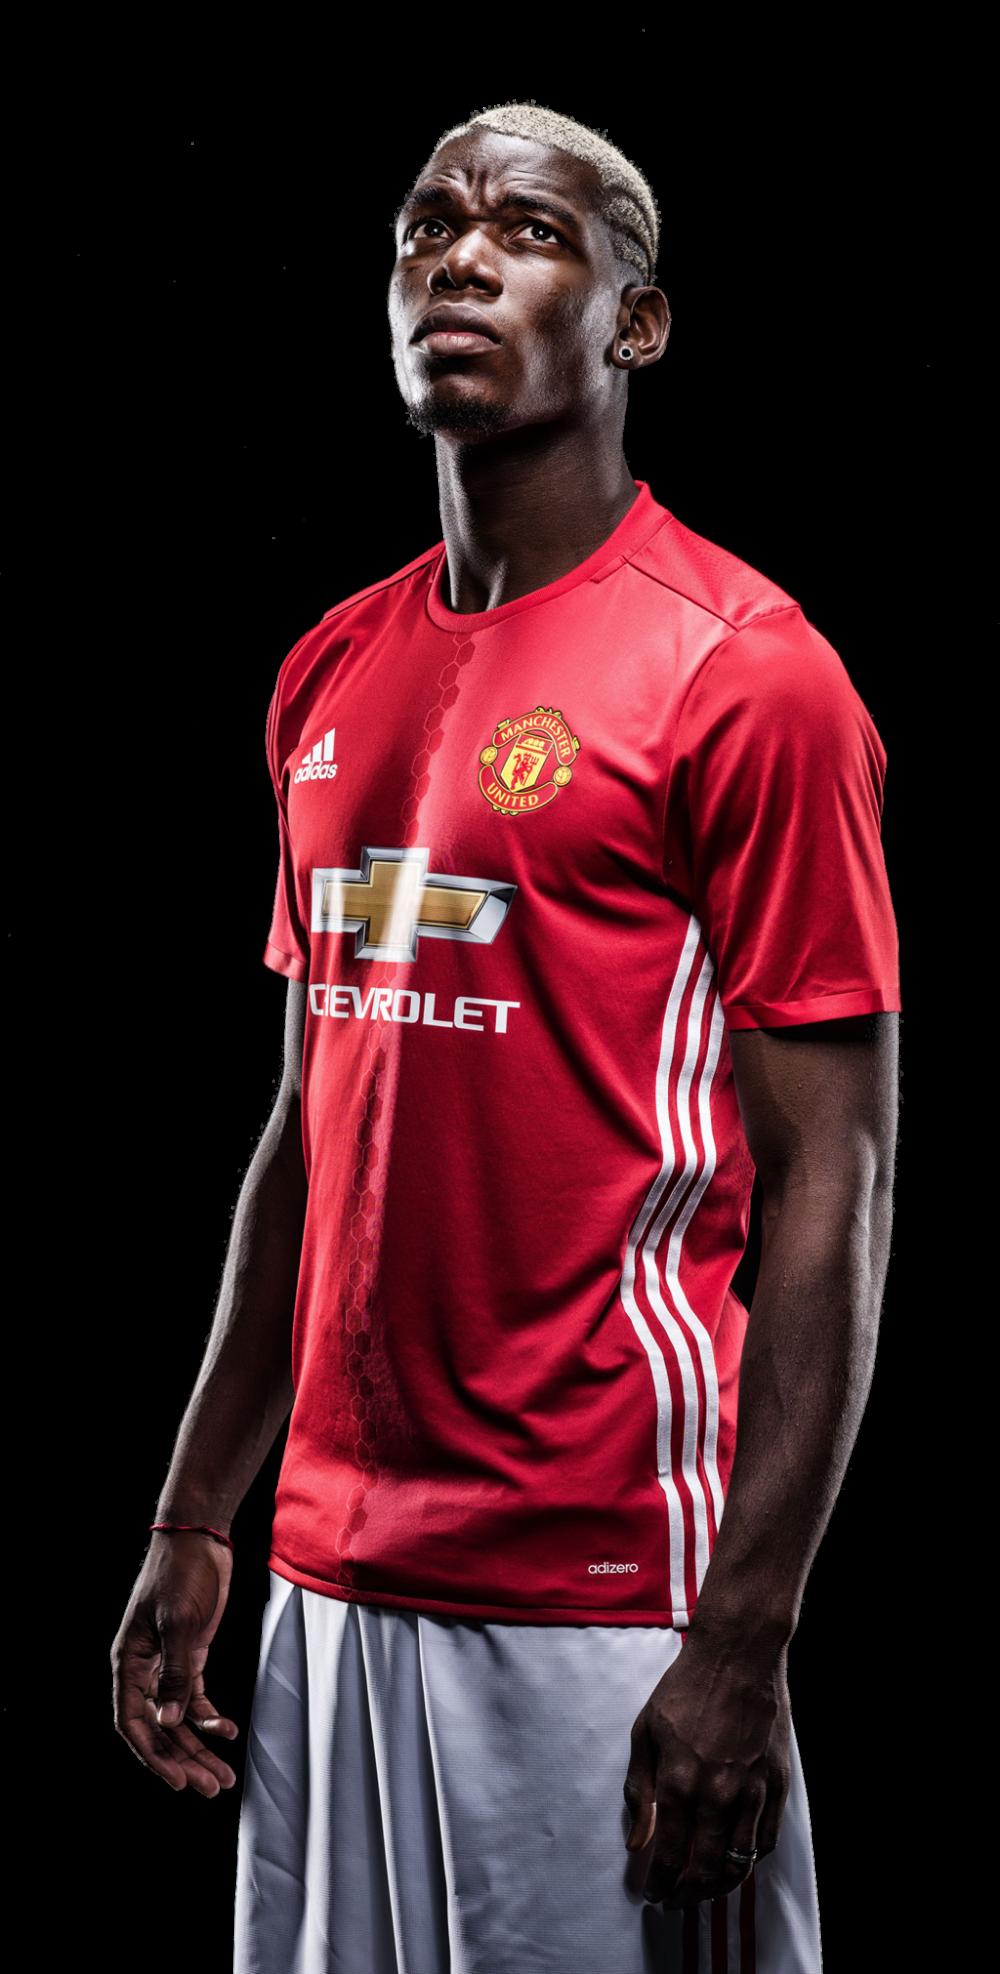 Paul Pogba Of Manchester United Soccer Paul Pogba Paul Pogba Paul Pogba Manchester United Soccer Paul Pogba Manchester United